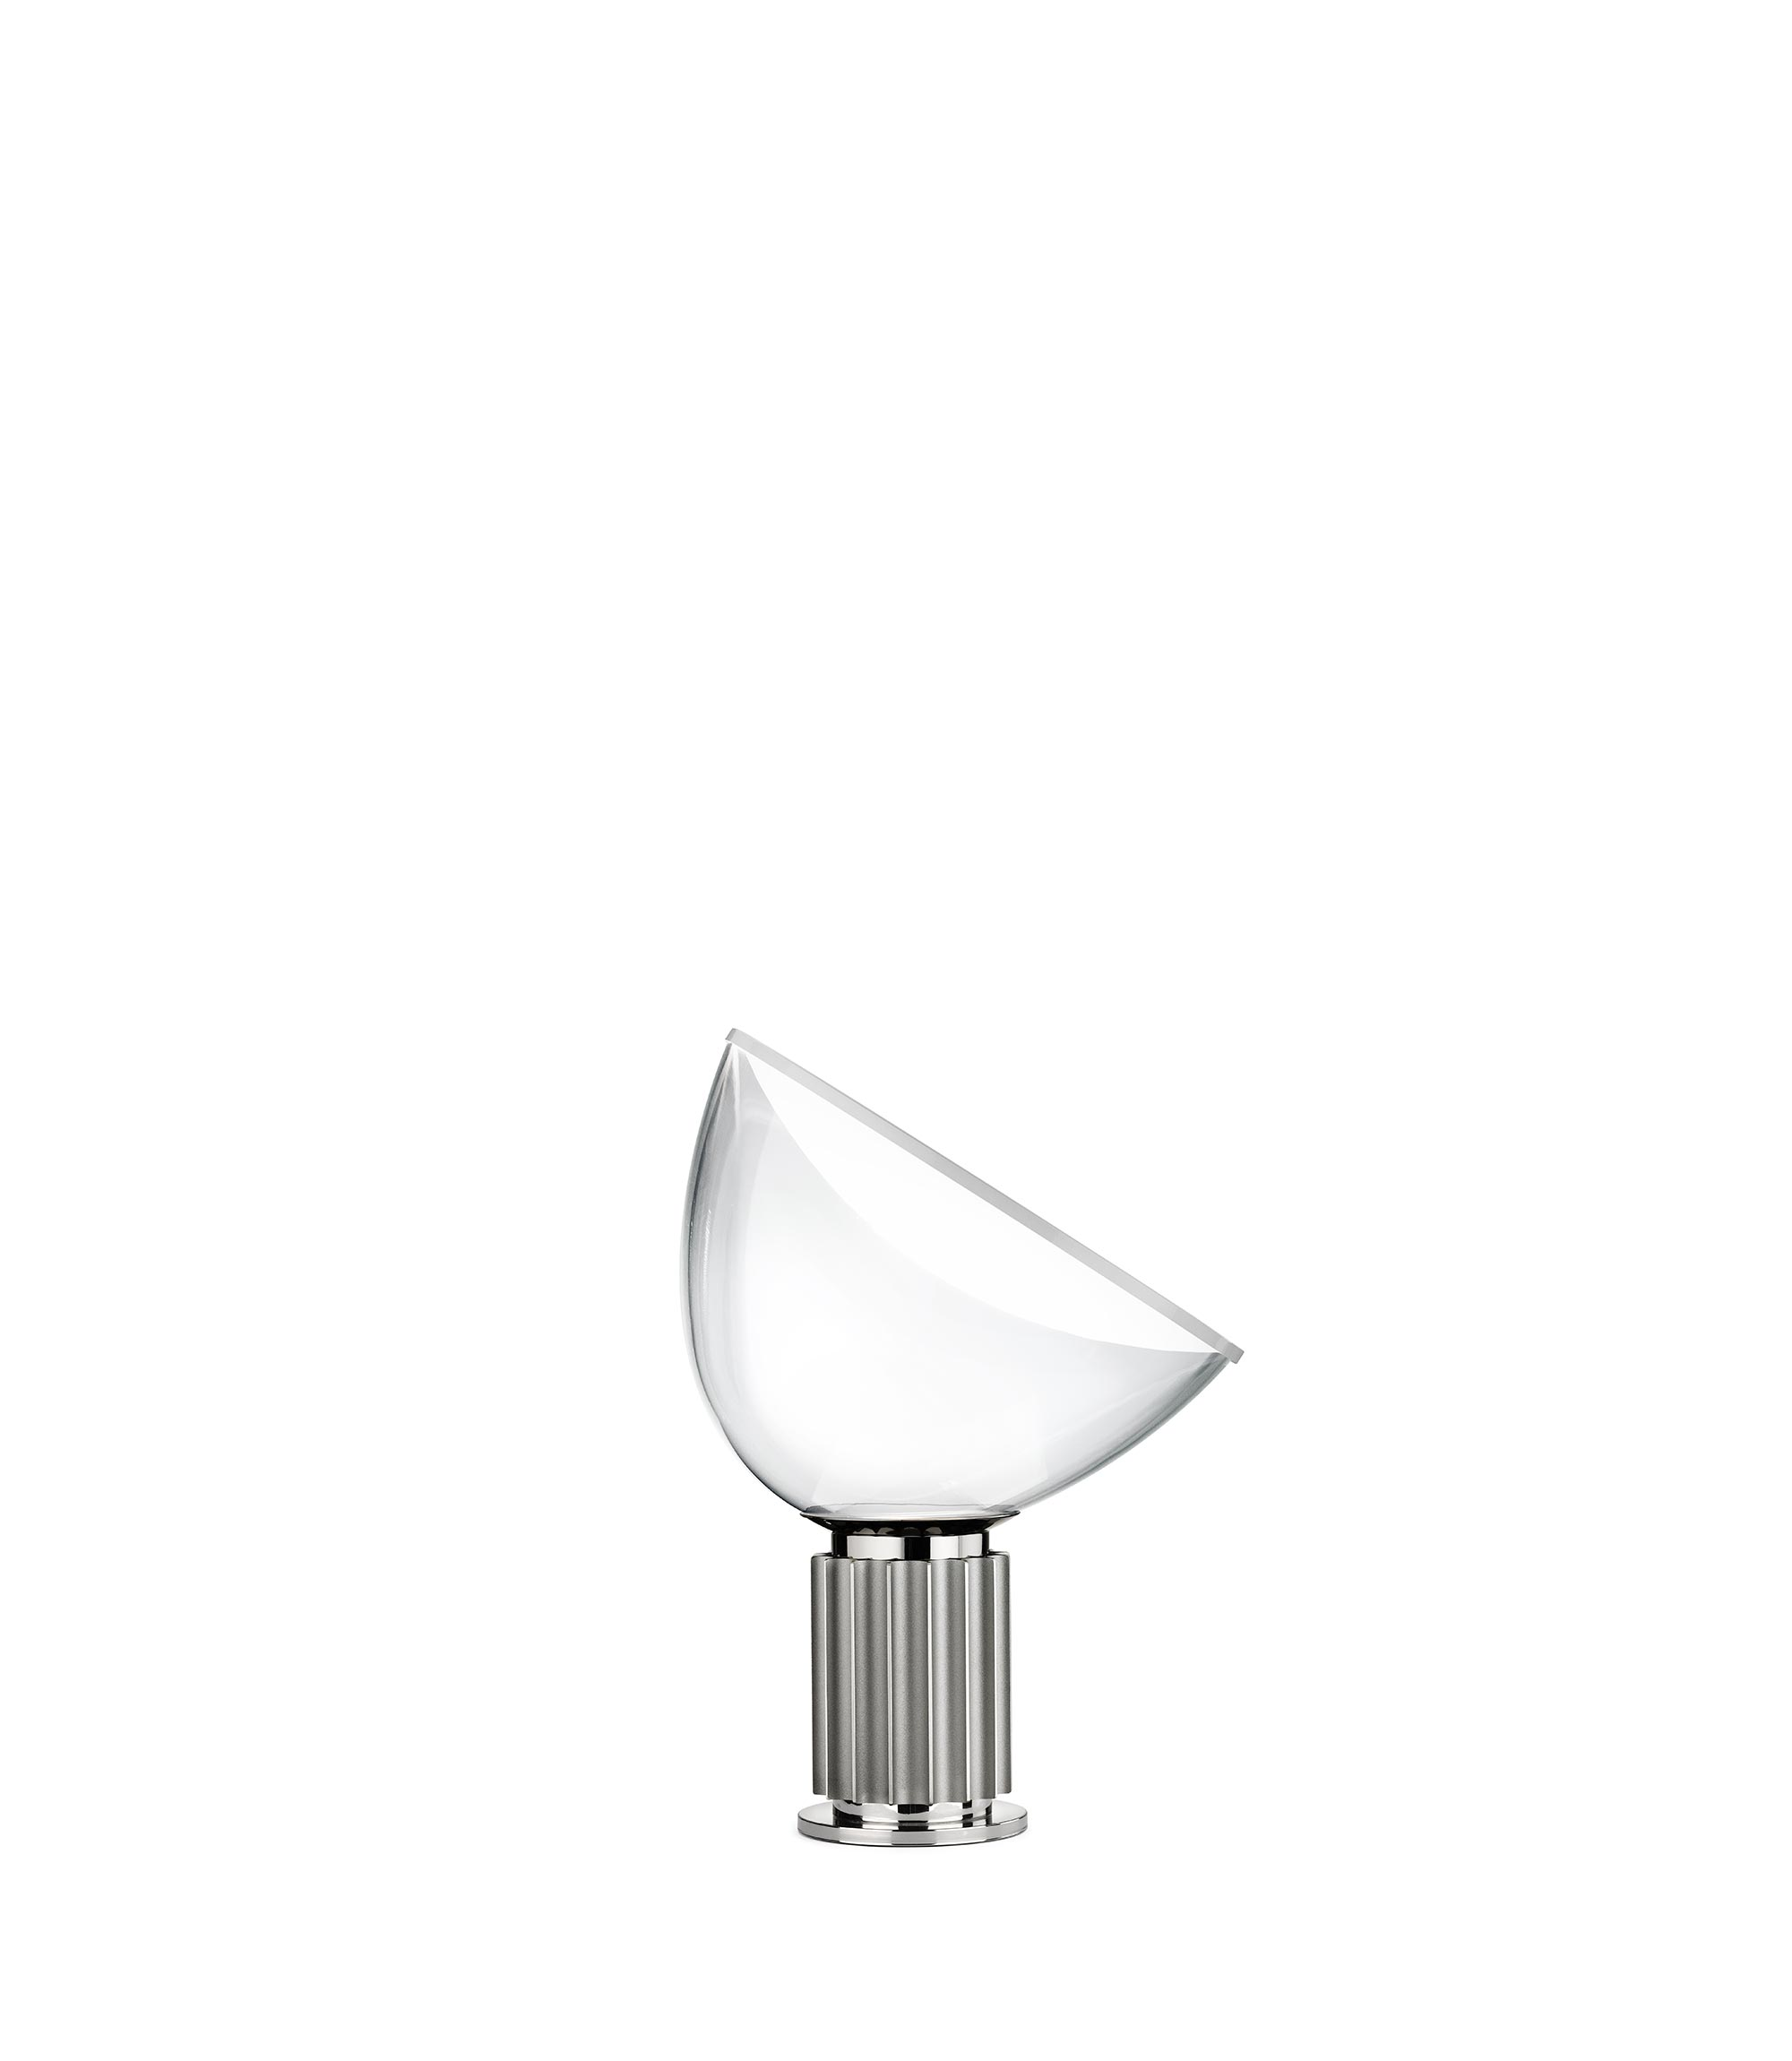 Taccia small table a pg castiglioni flos F6604004 product still life big